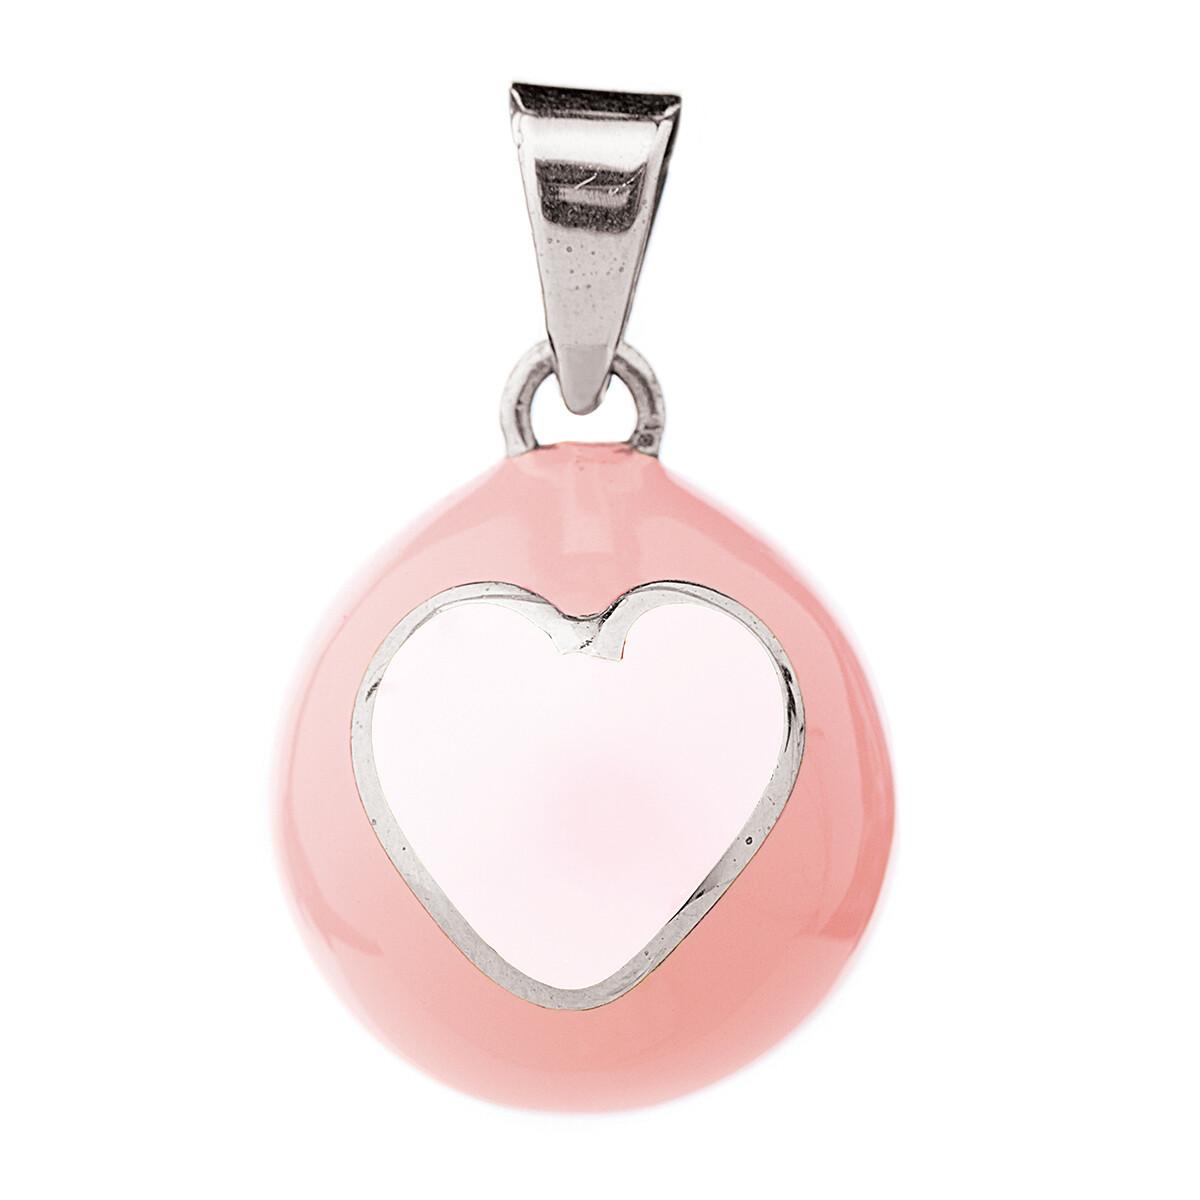 Bola Μενταγιόν εγκυμοσύνης - Ρόζ με άσπρη καρδιά